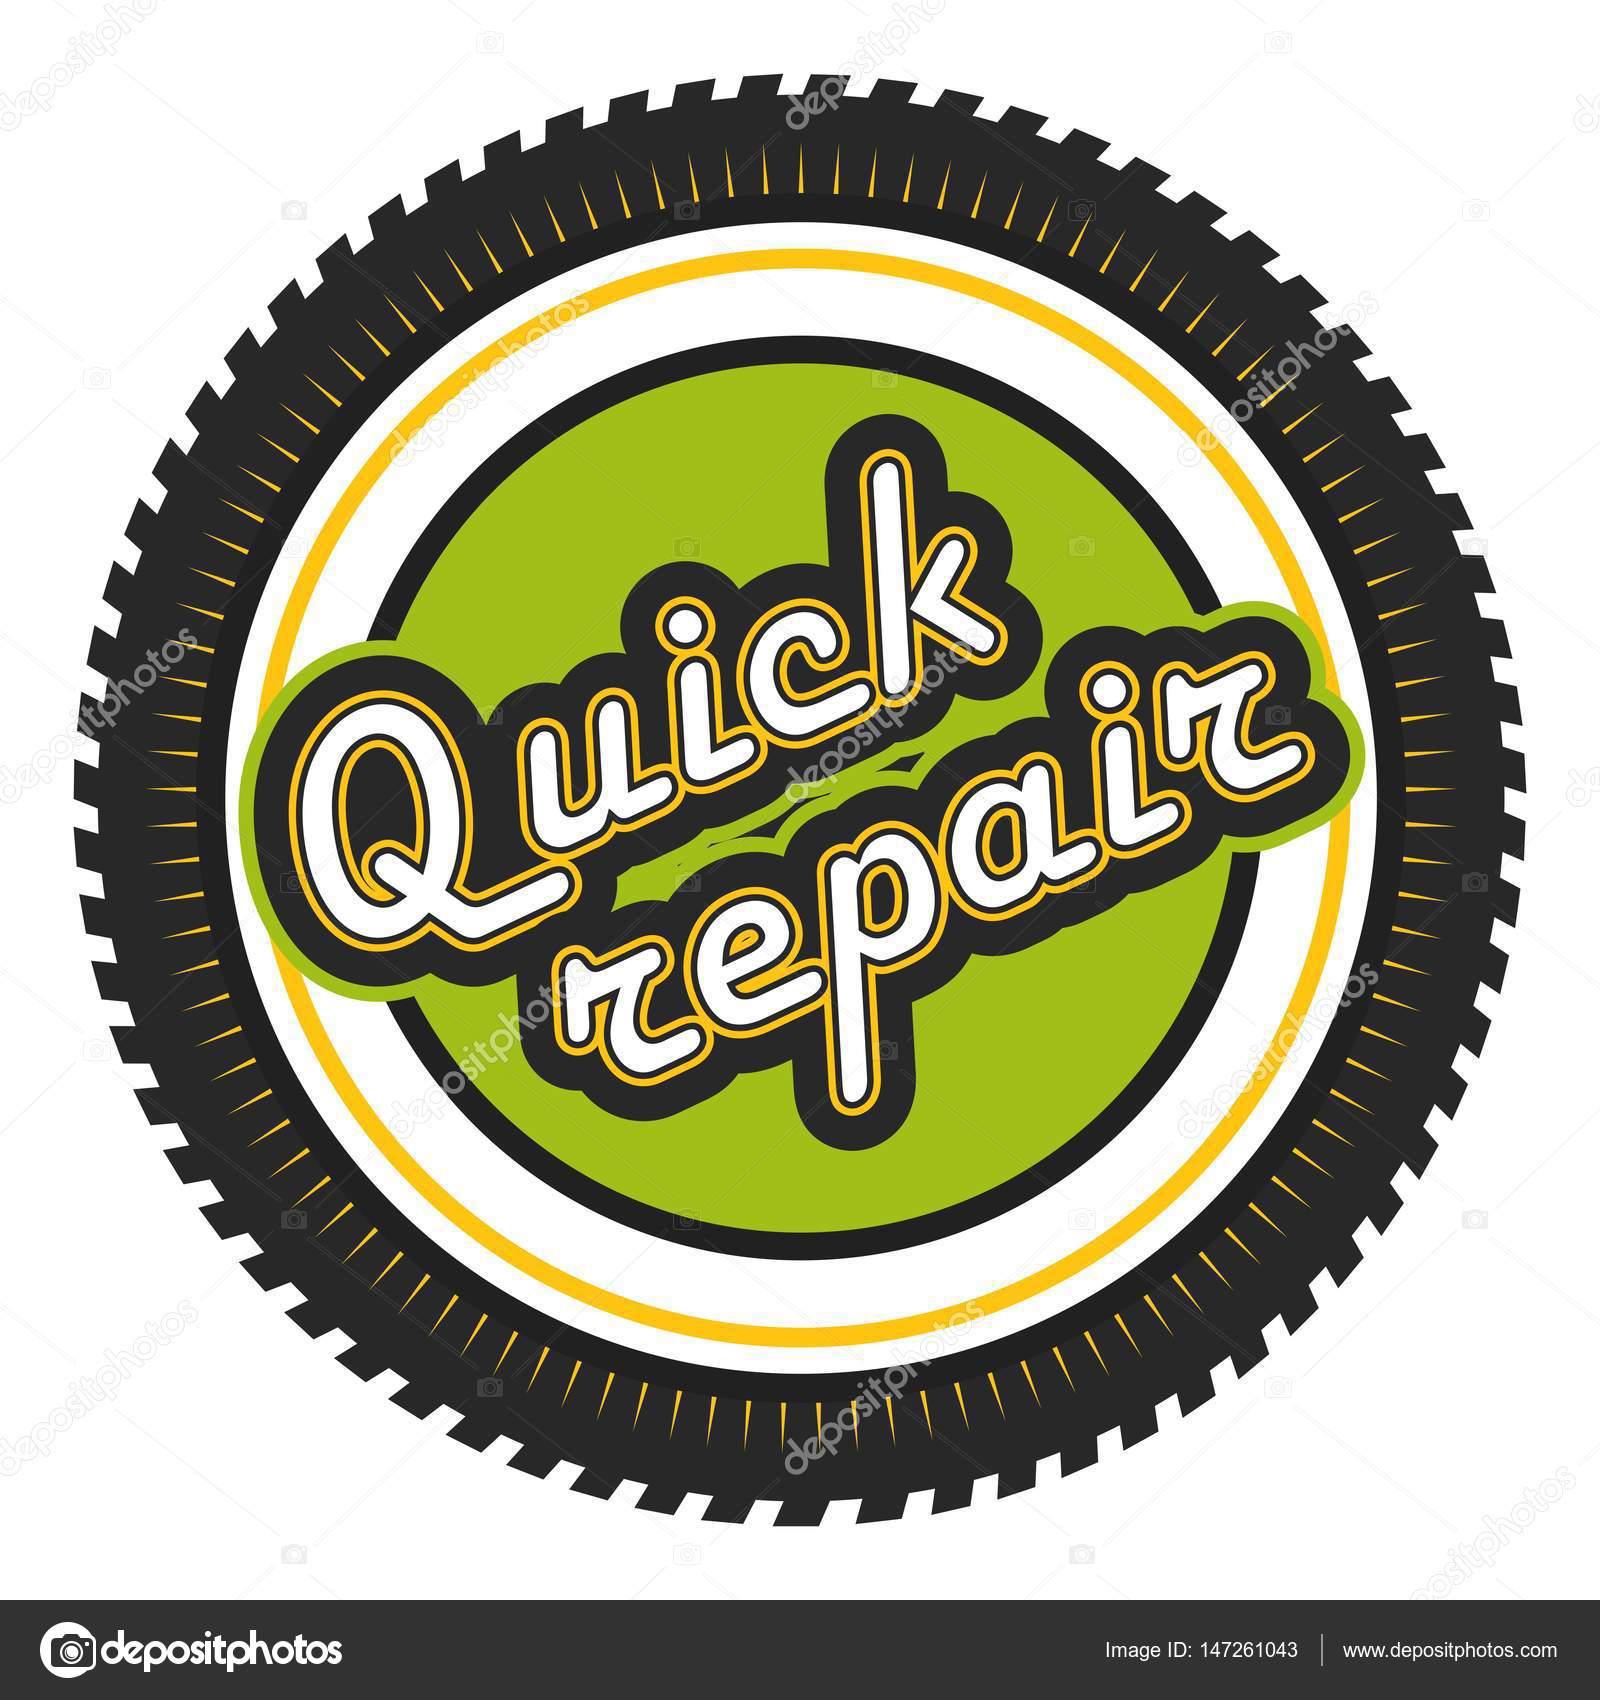 Quick Repair badge — Stock Vector © marrishuannna #147261043